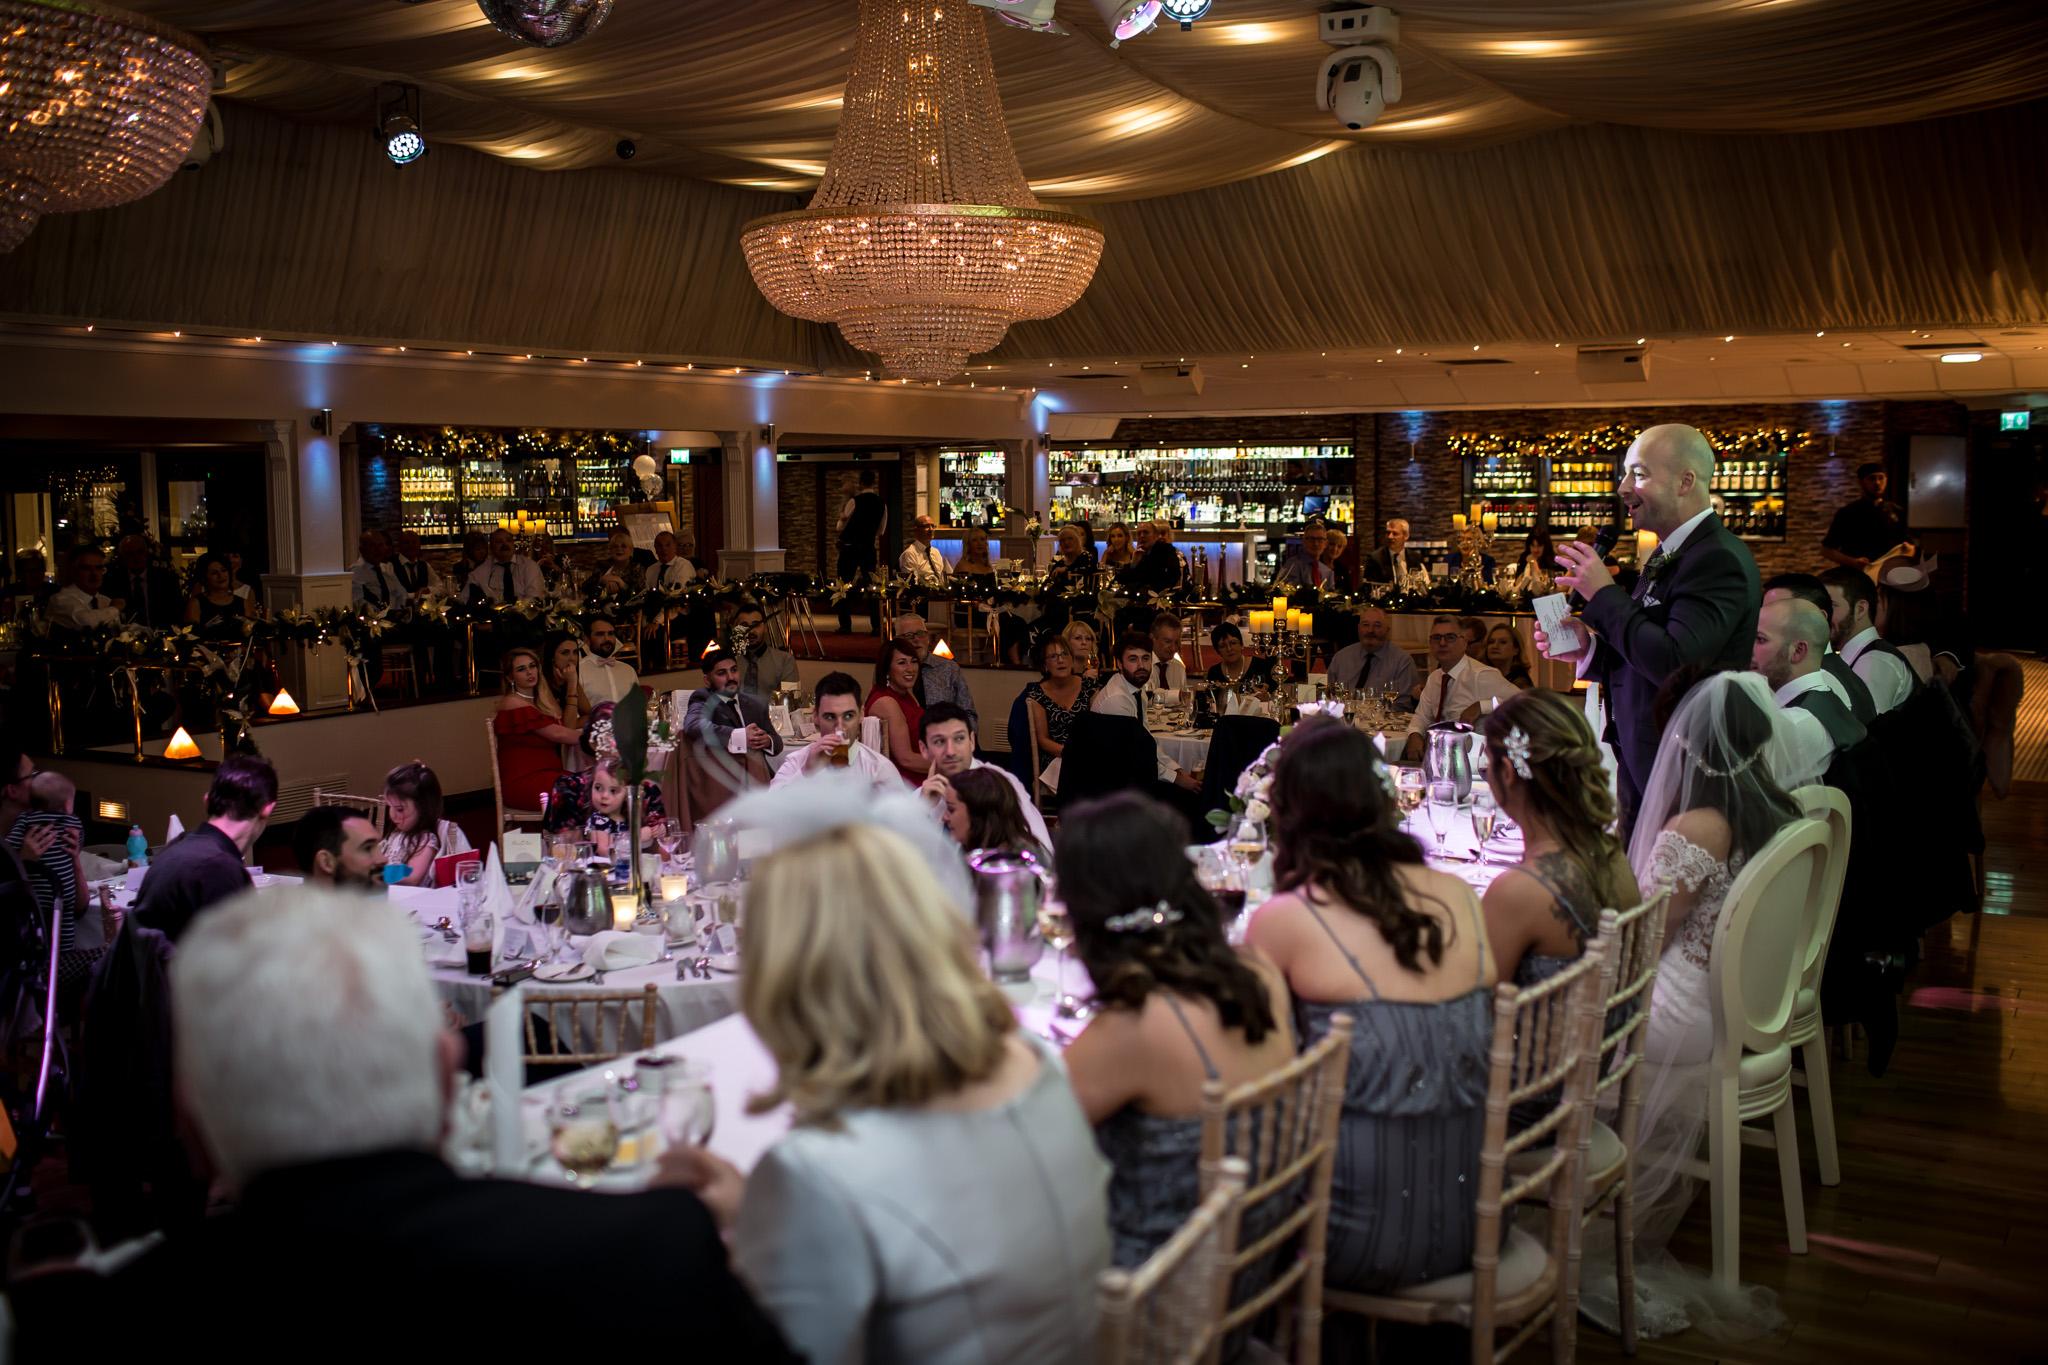 Mark_Barnes_Northern_Ireland_wedding_photographer_Harveys_Point_Donegall_Wedding_photography-Adam&Gemma-50.jpg